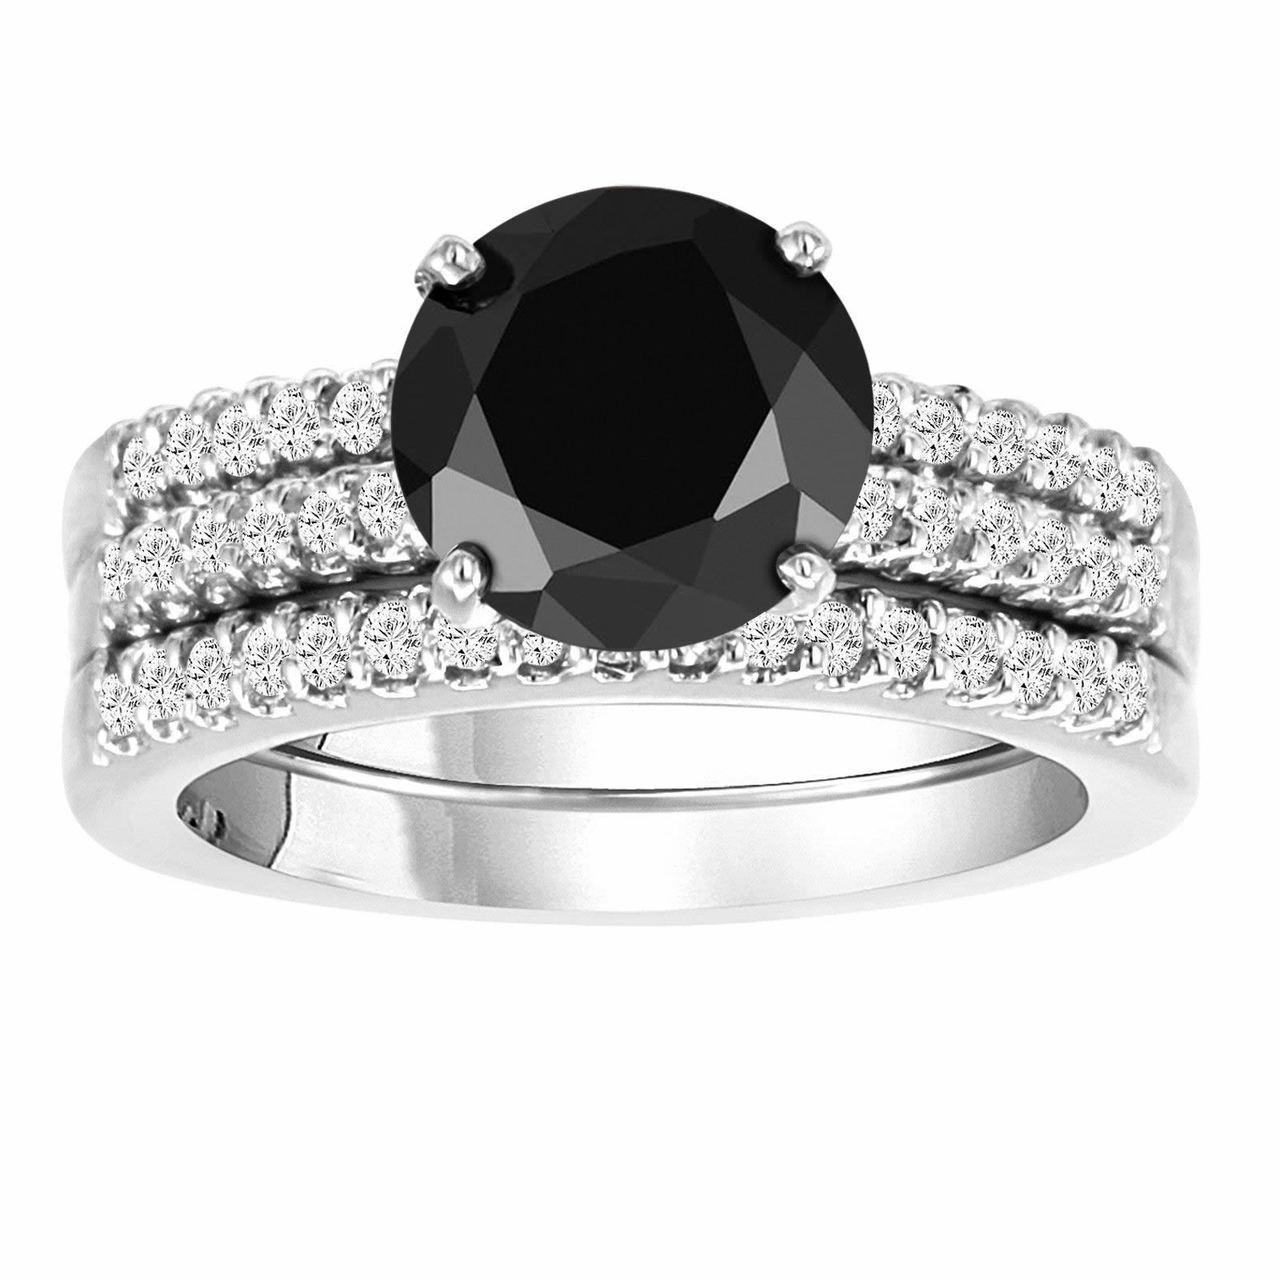 1 25ct Black Diamond Engagement Rings Set 14k White Gold: Black Diamond Engagement Ring Set, Wedding Anniversary